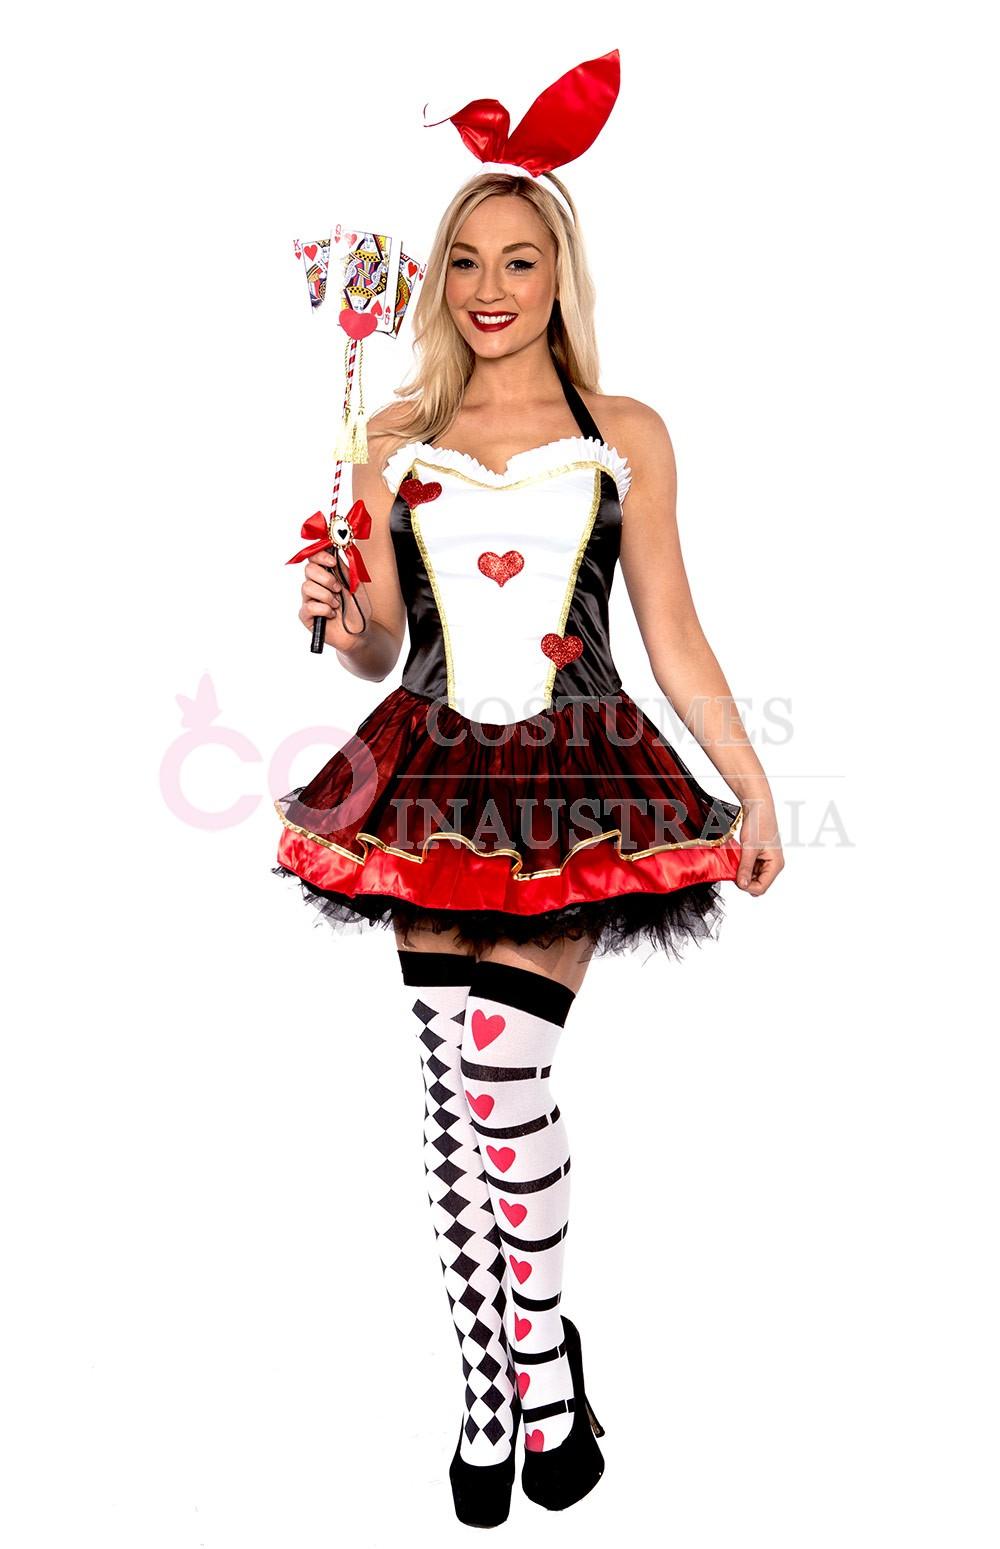 Alice in bunny costume and stockings masturbating 1